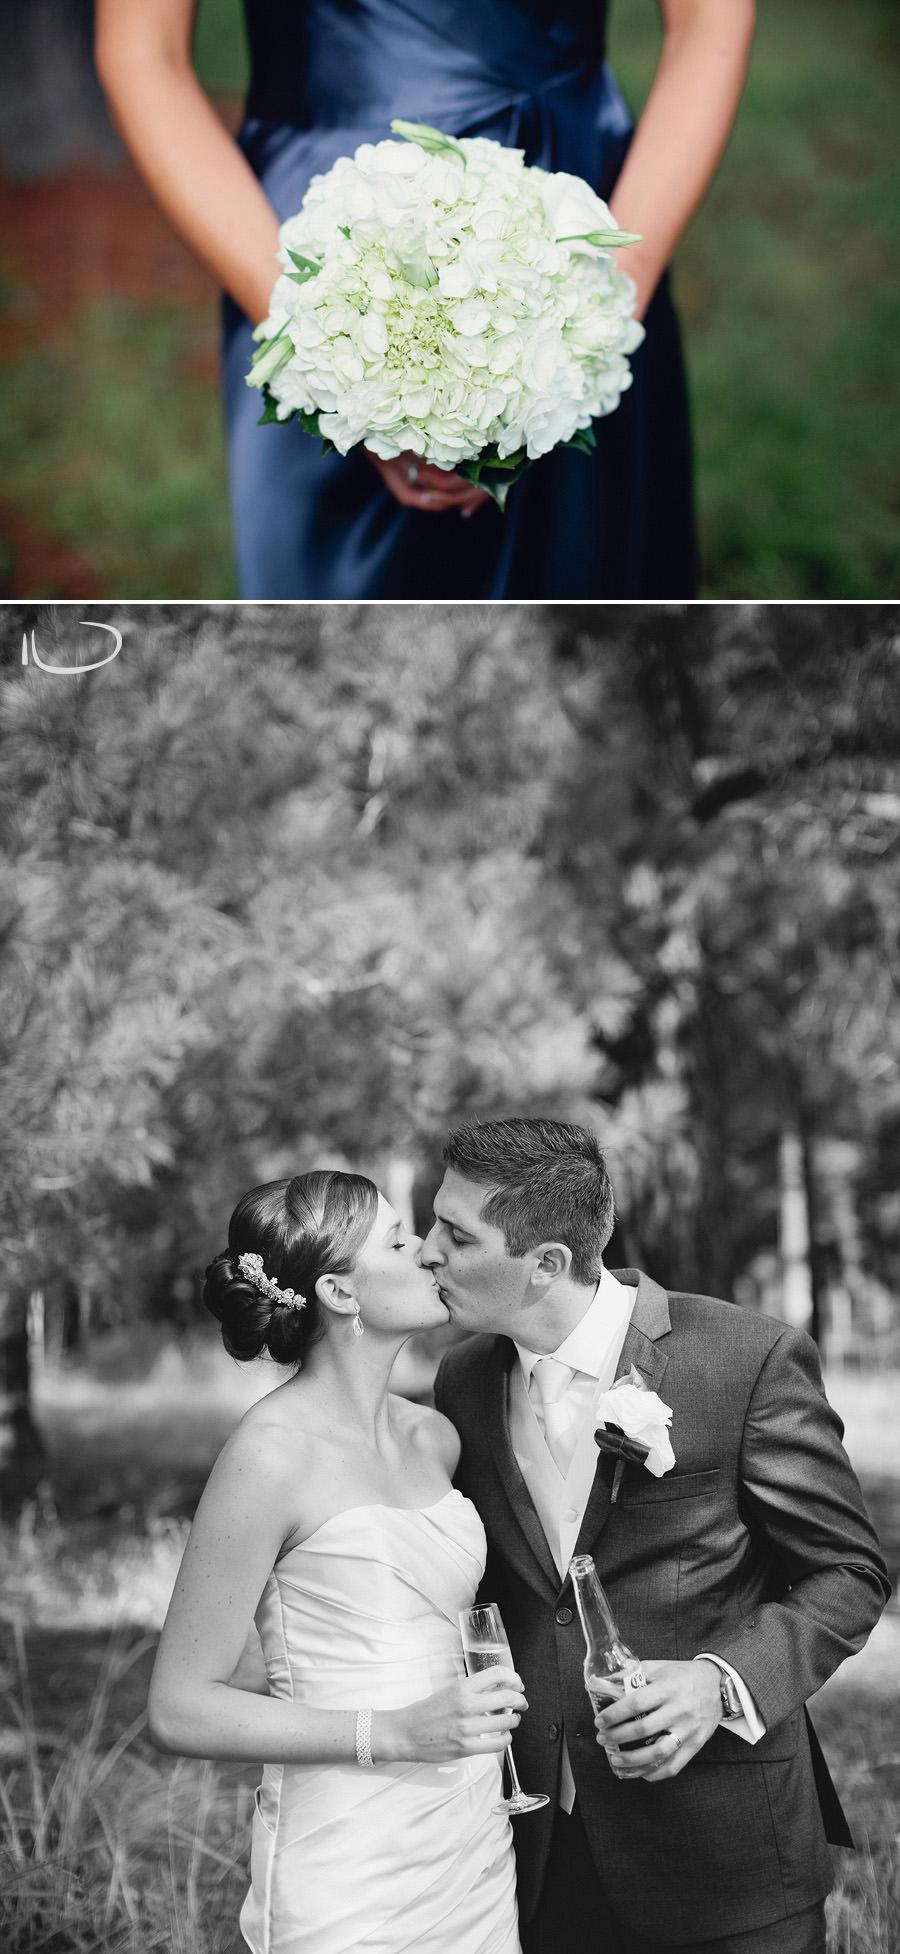 Sydney Wedding Photographer: Bride & Groom portrait